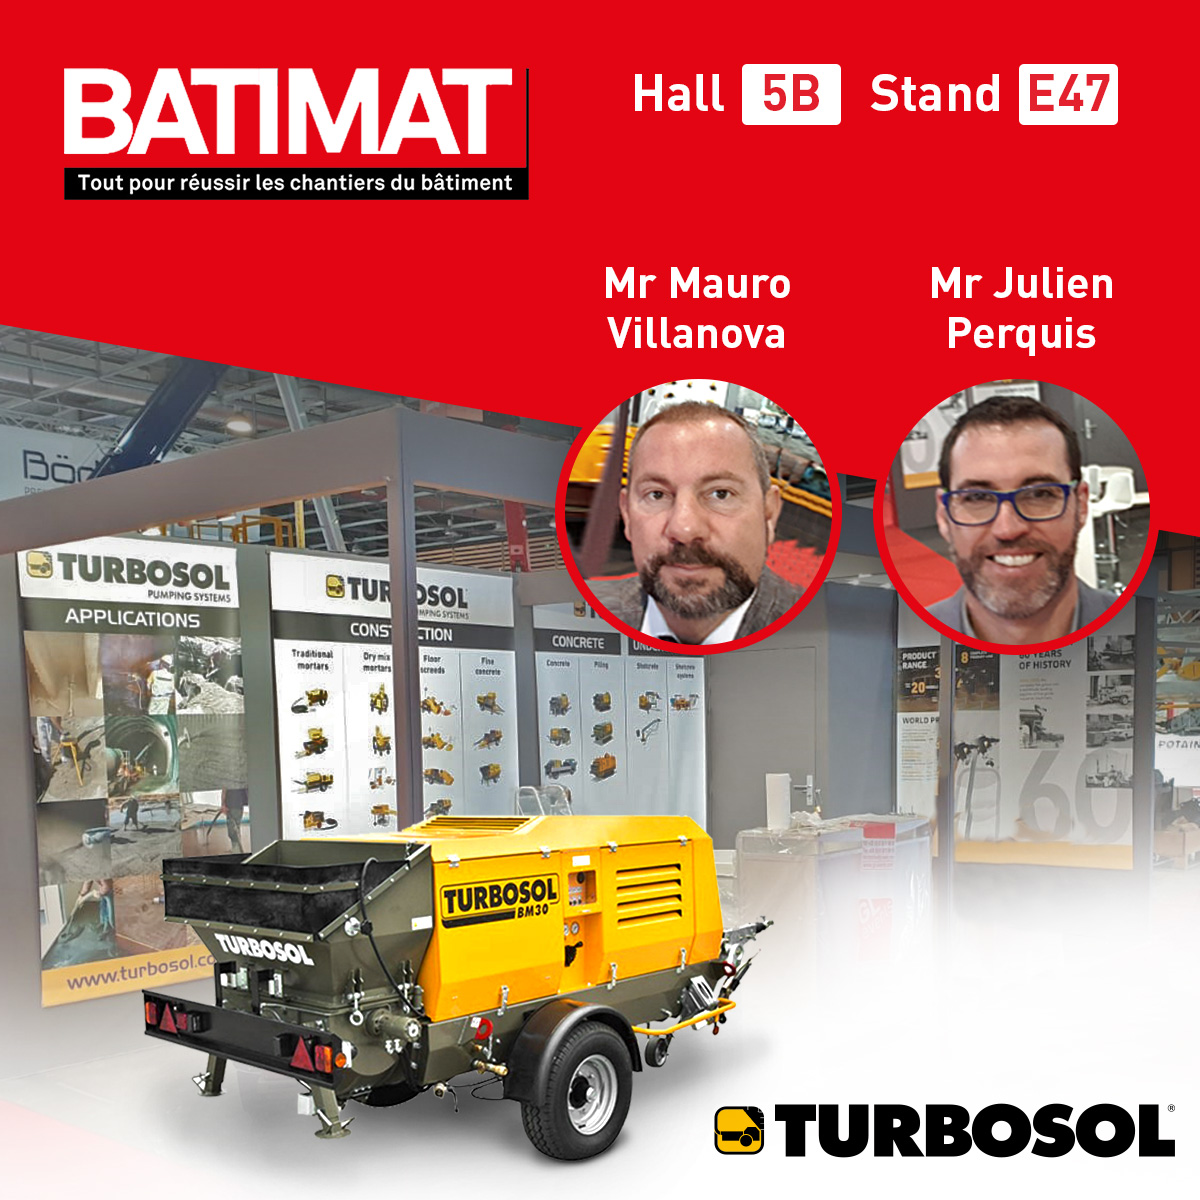 Visita lo stand Turbosol a Batimat 2019!